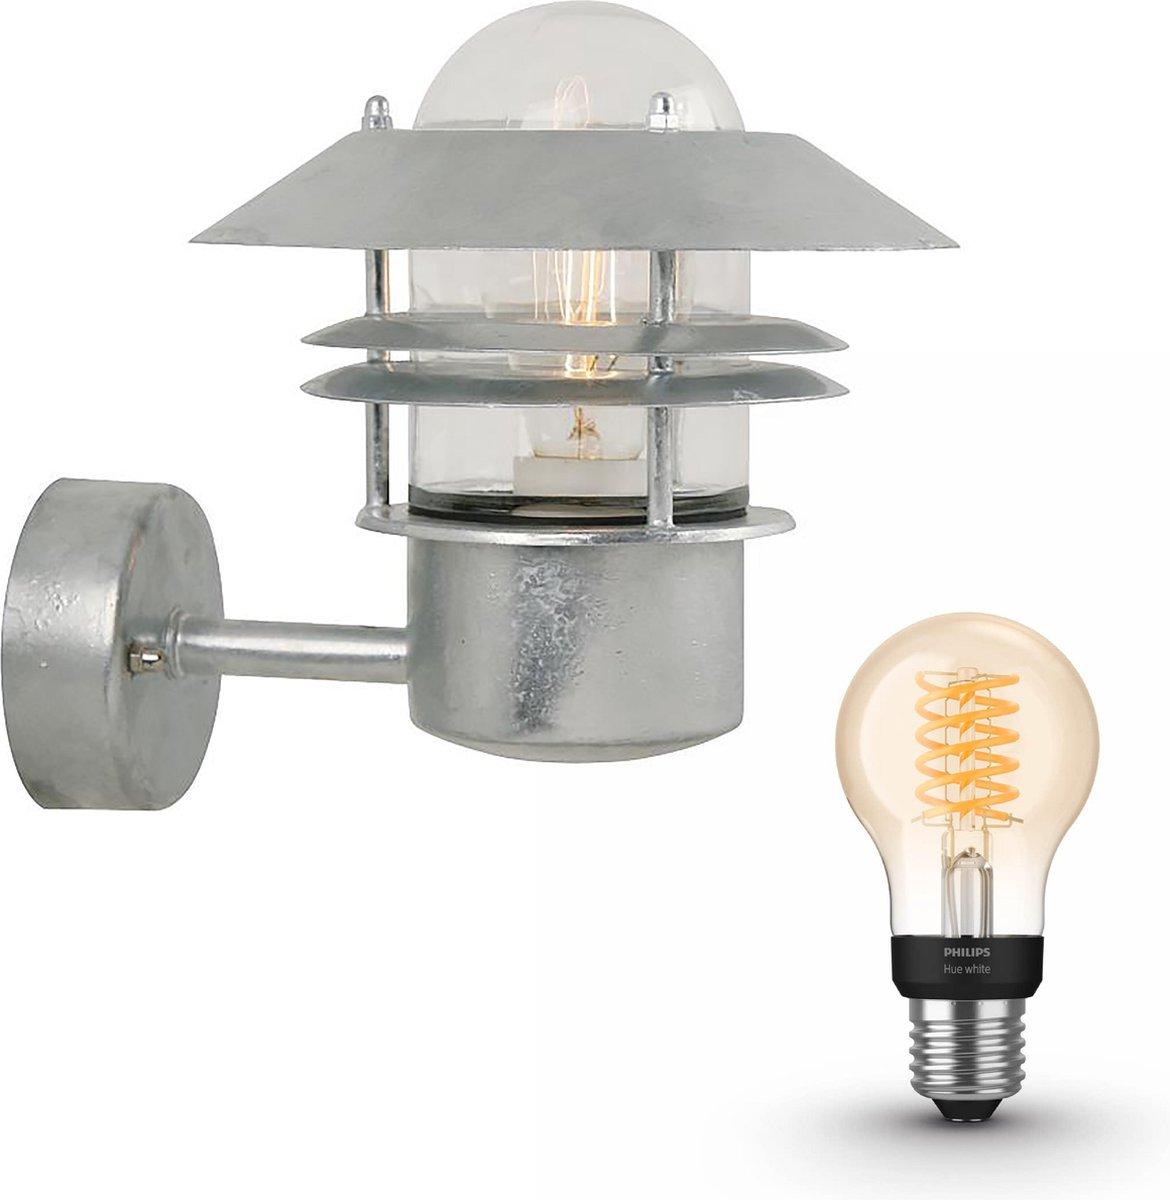 Nordlux Blokhus wandlamp - zink - 1 lichtpunt - incl. Philips Hue White Filament standaardlamp E27